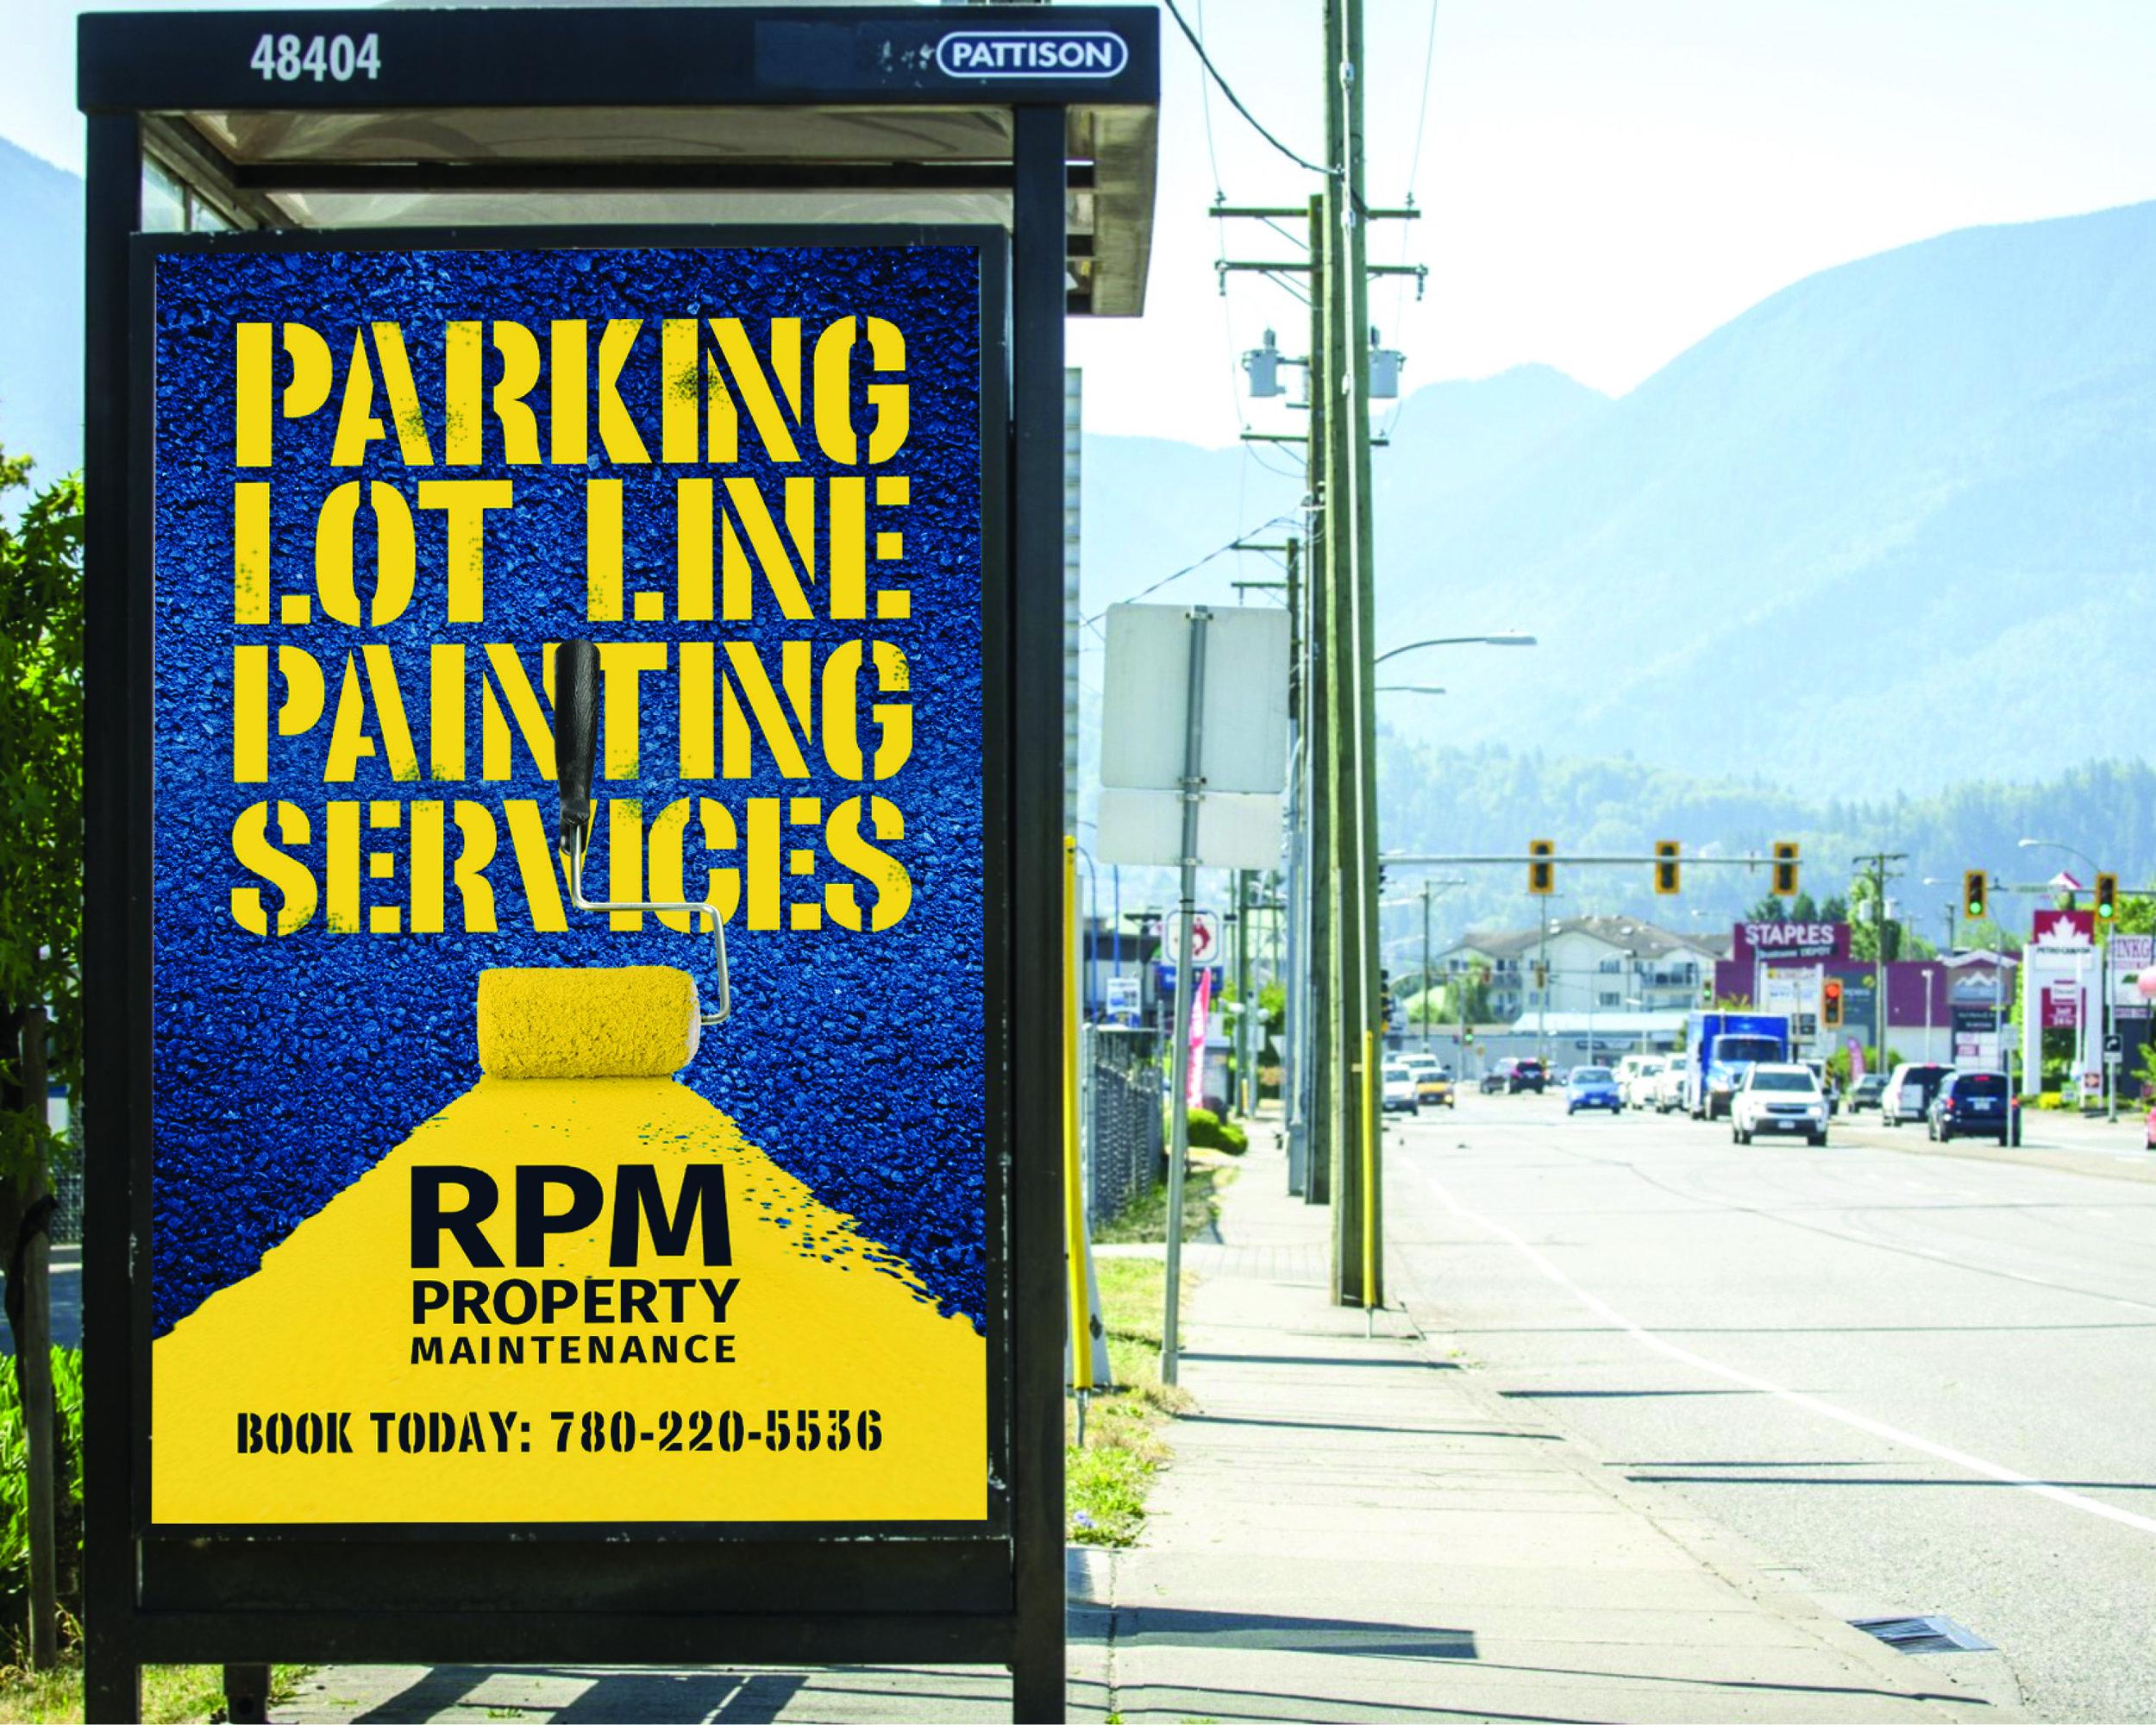 parking-lot-services.jpg